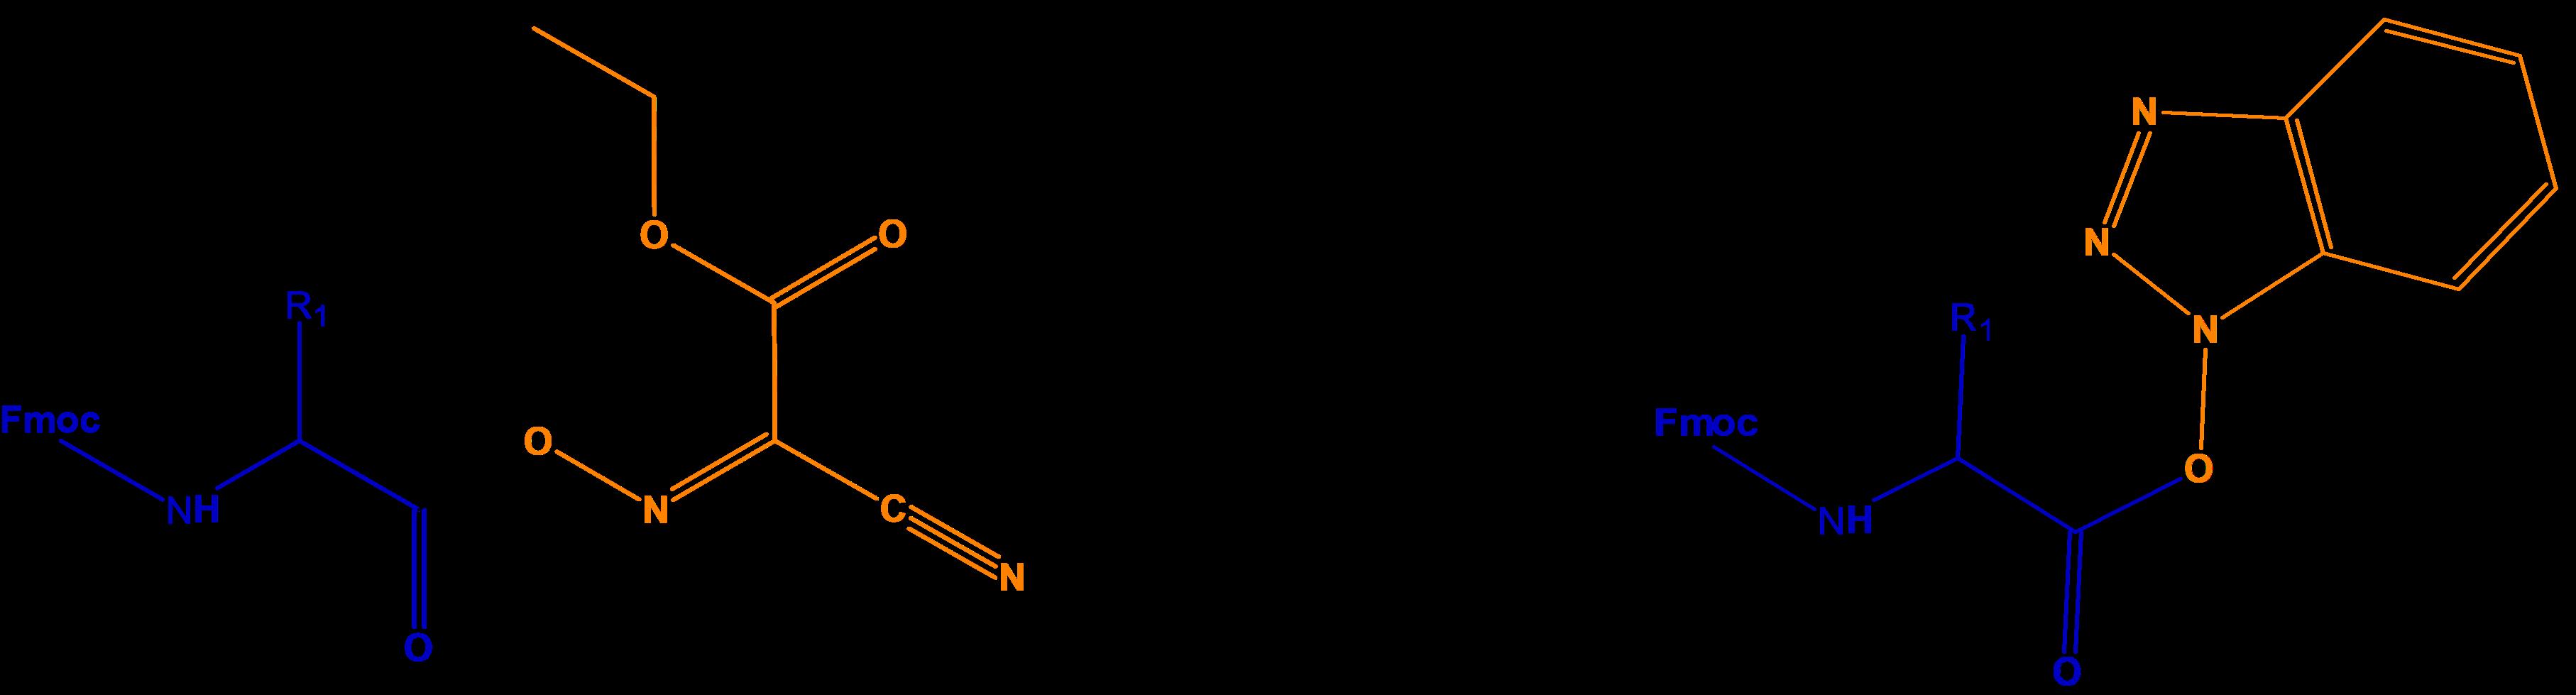 figure 3 - structures